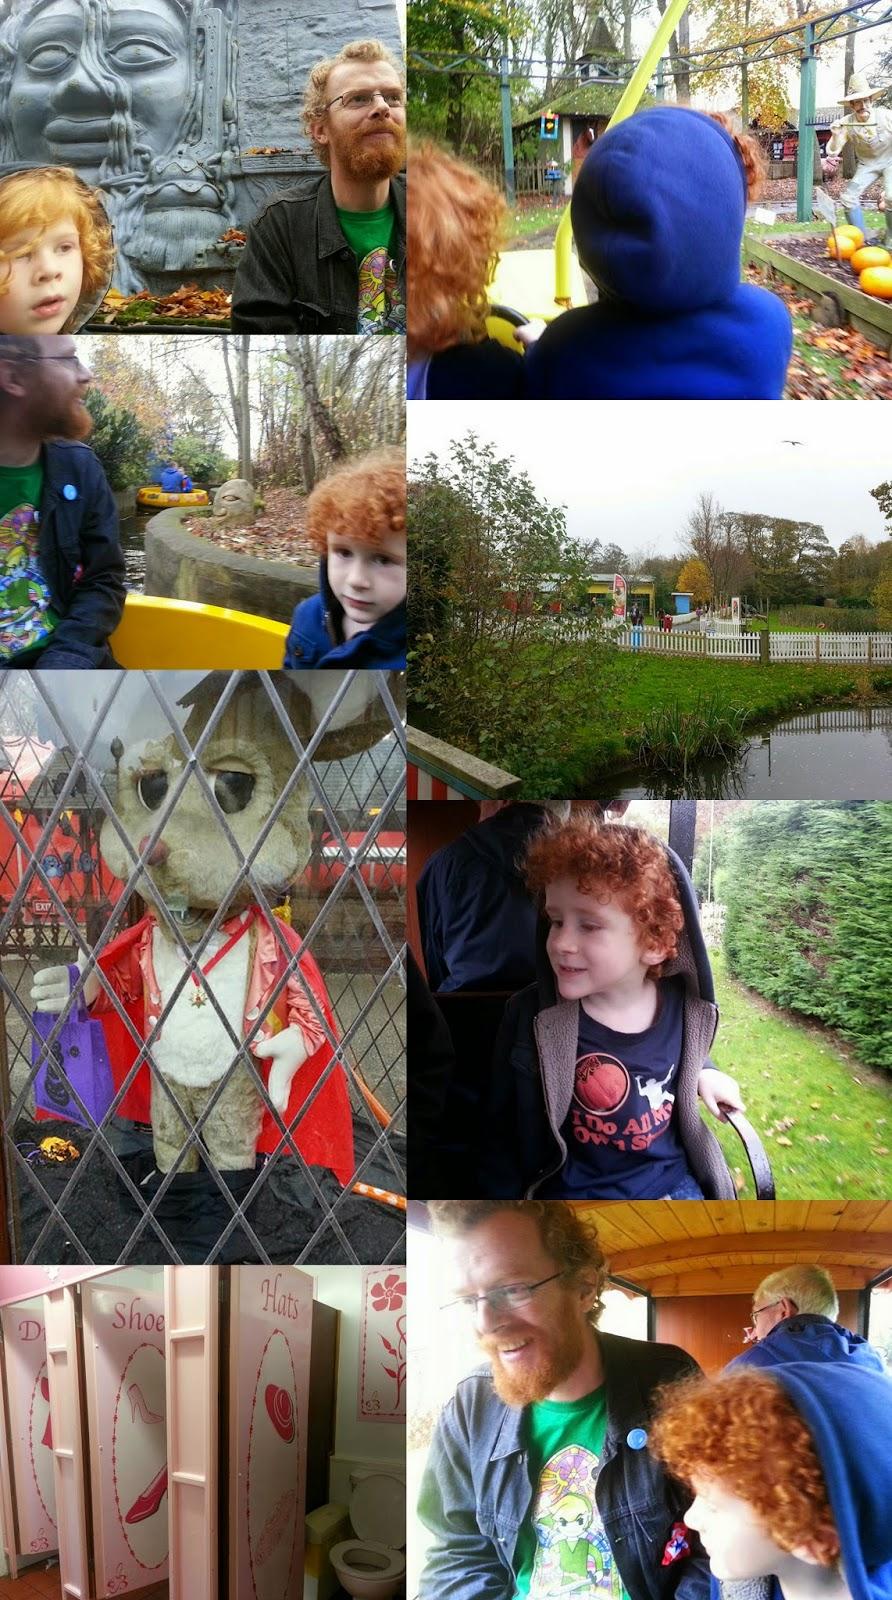 Gulliver's World Children's theme park in the northwest rides and amusements